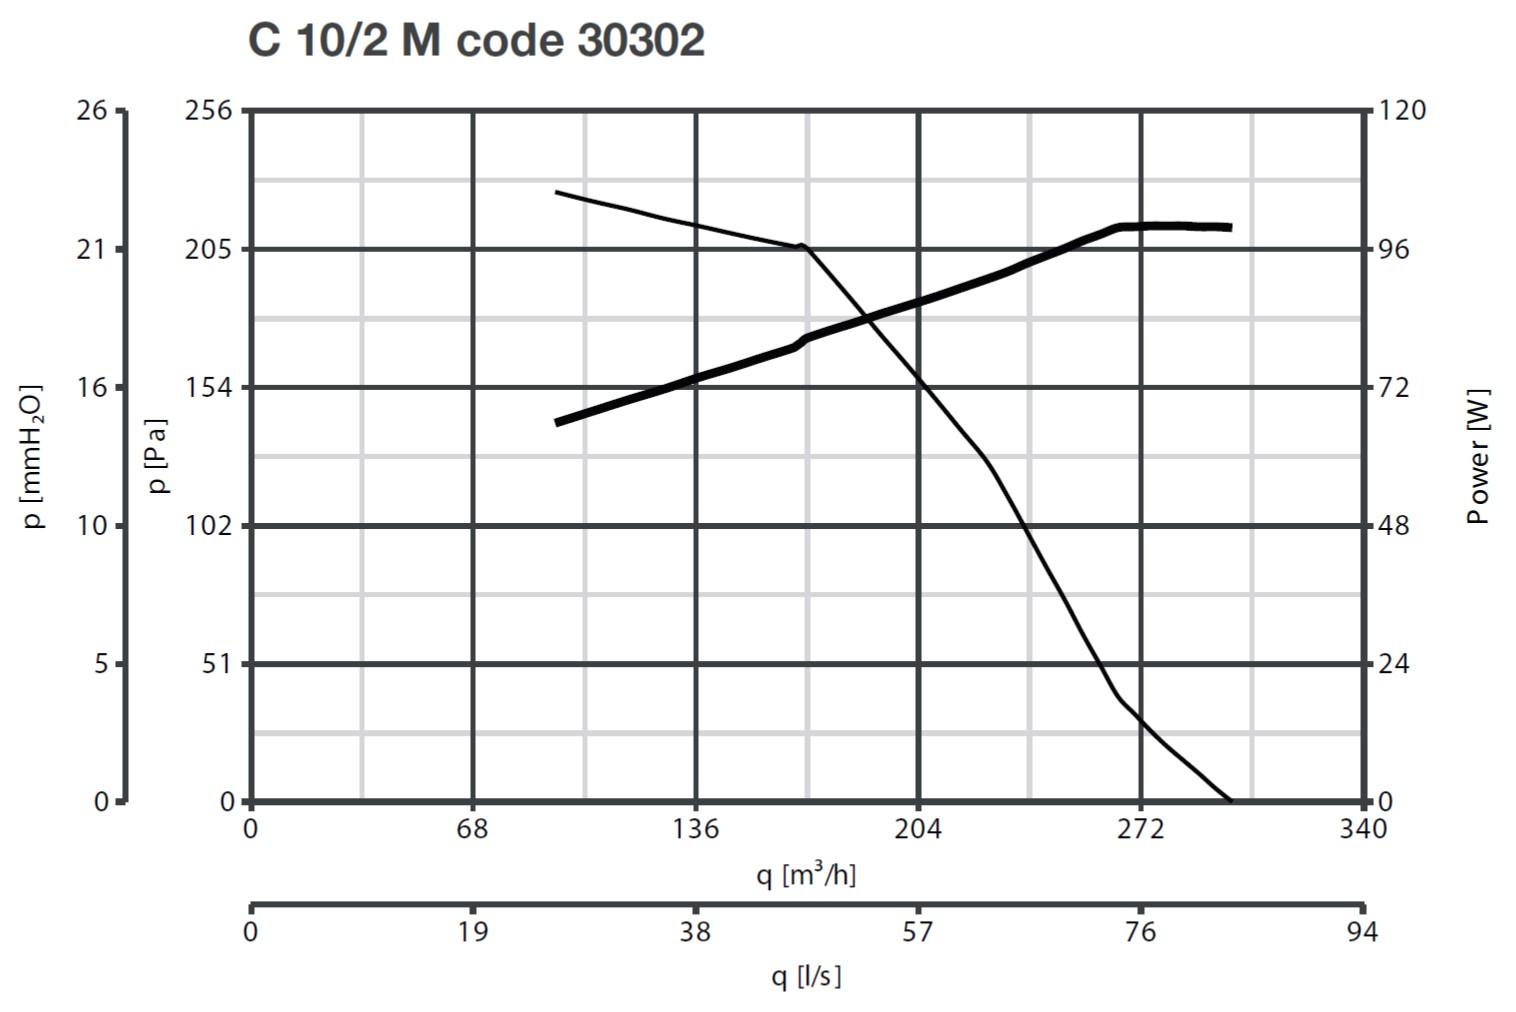 Curba caracteristica ventilator centrifugal Vorticent C 10/2 M